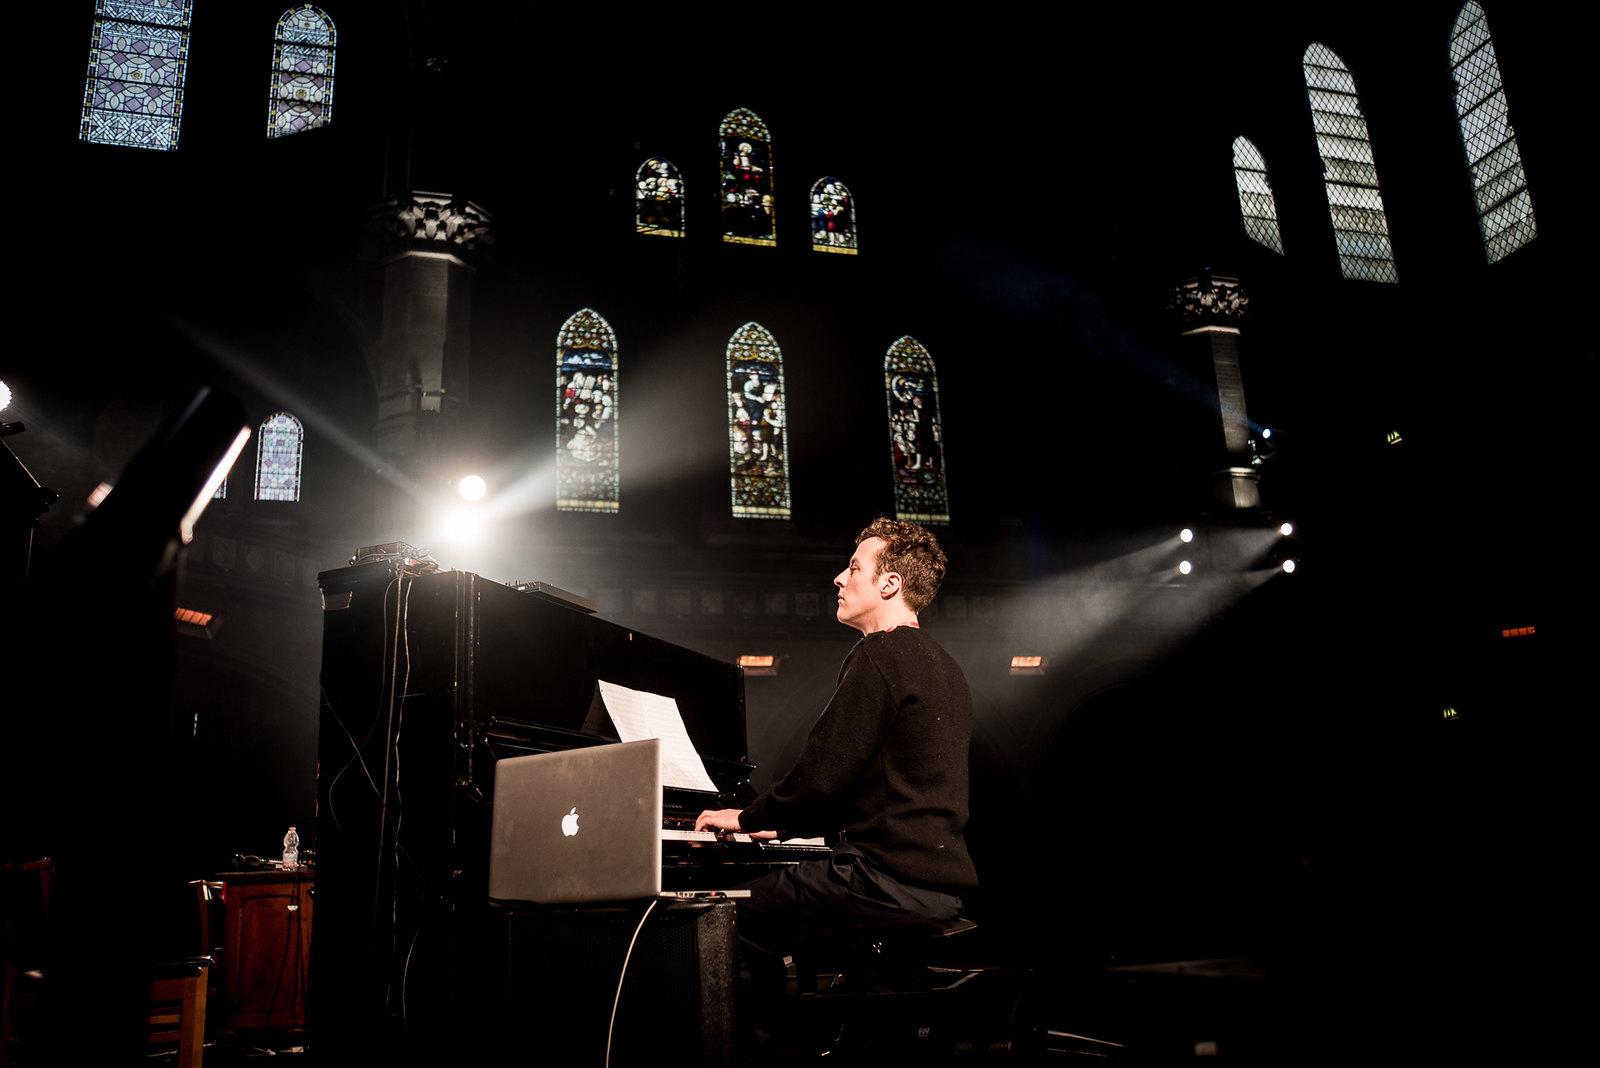 Daylight Music 214 - Dakota Suite & Quentin Sirjacq